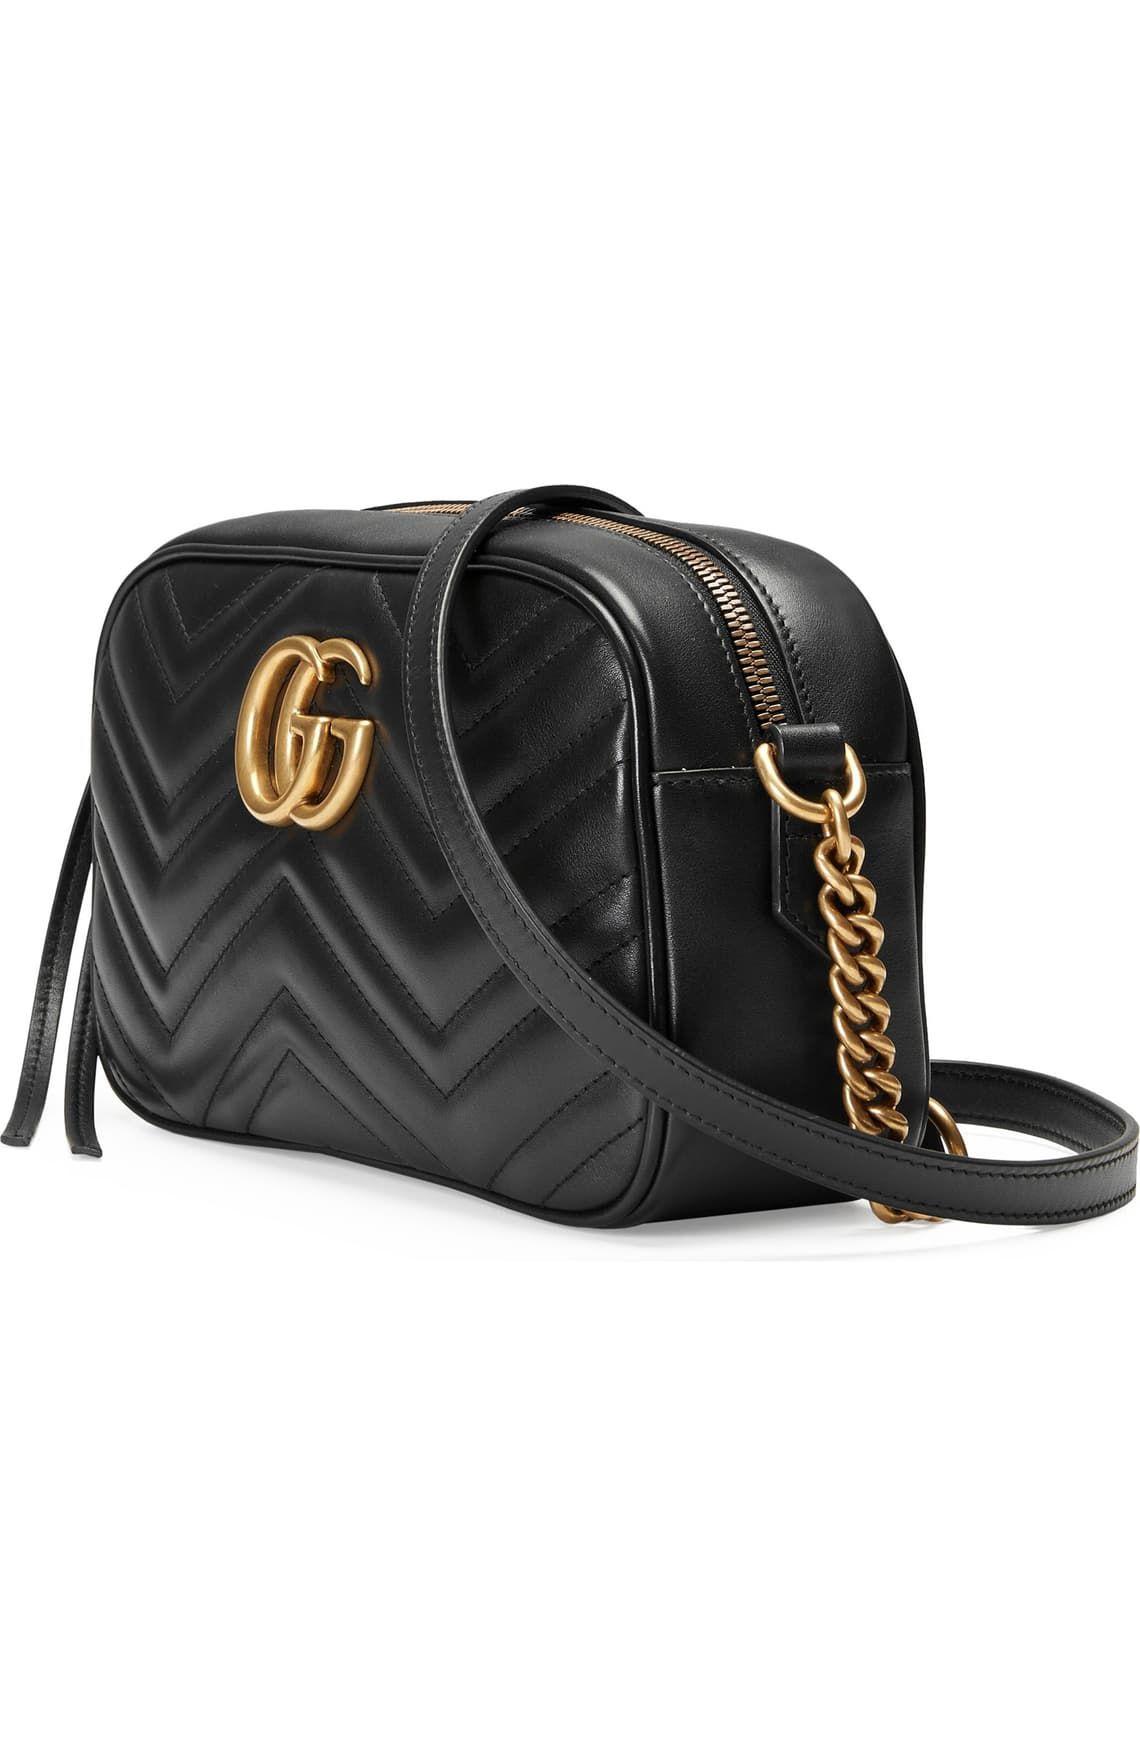 Gucci Small Gg Marmont 2.0 Matelassé Leather Camera Bag in